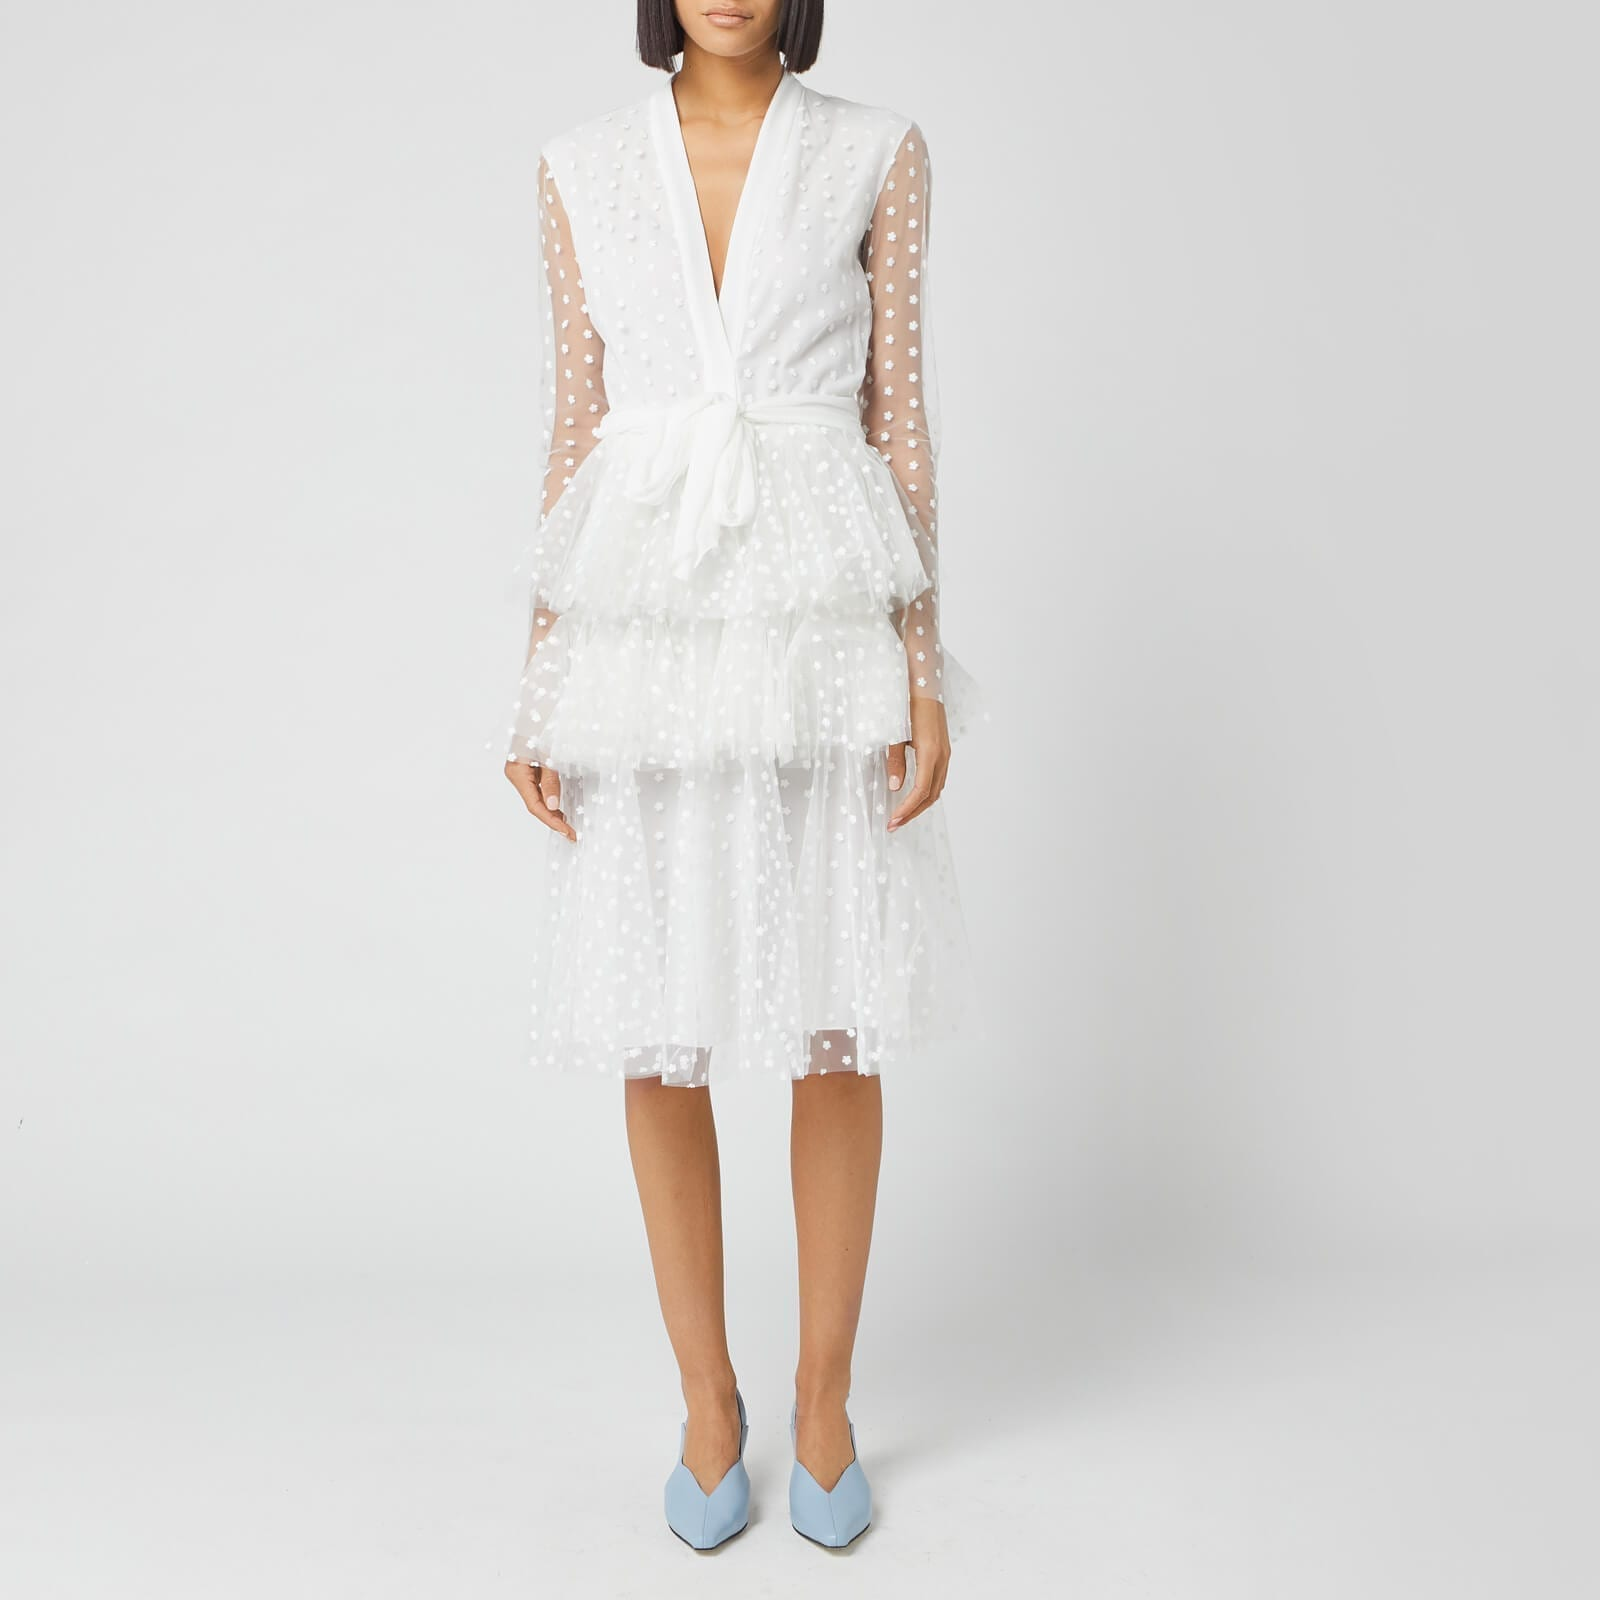 PHILOSOPHY DI LORENZO SERAFINI Women's Tiered Ruffle Dress